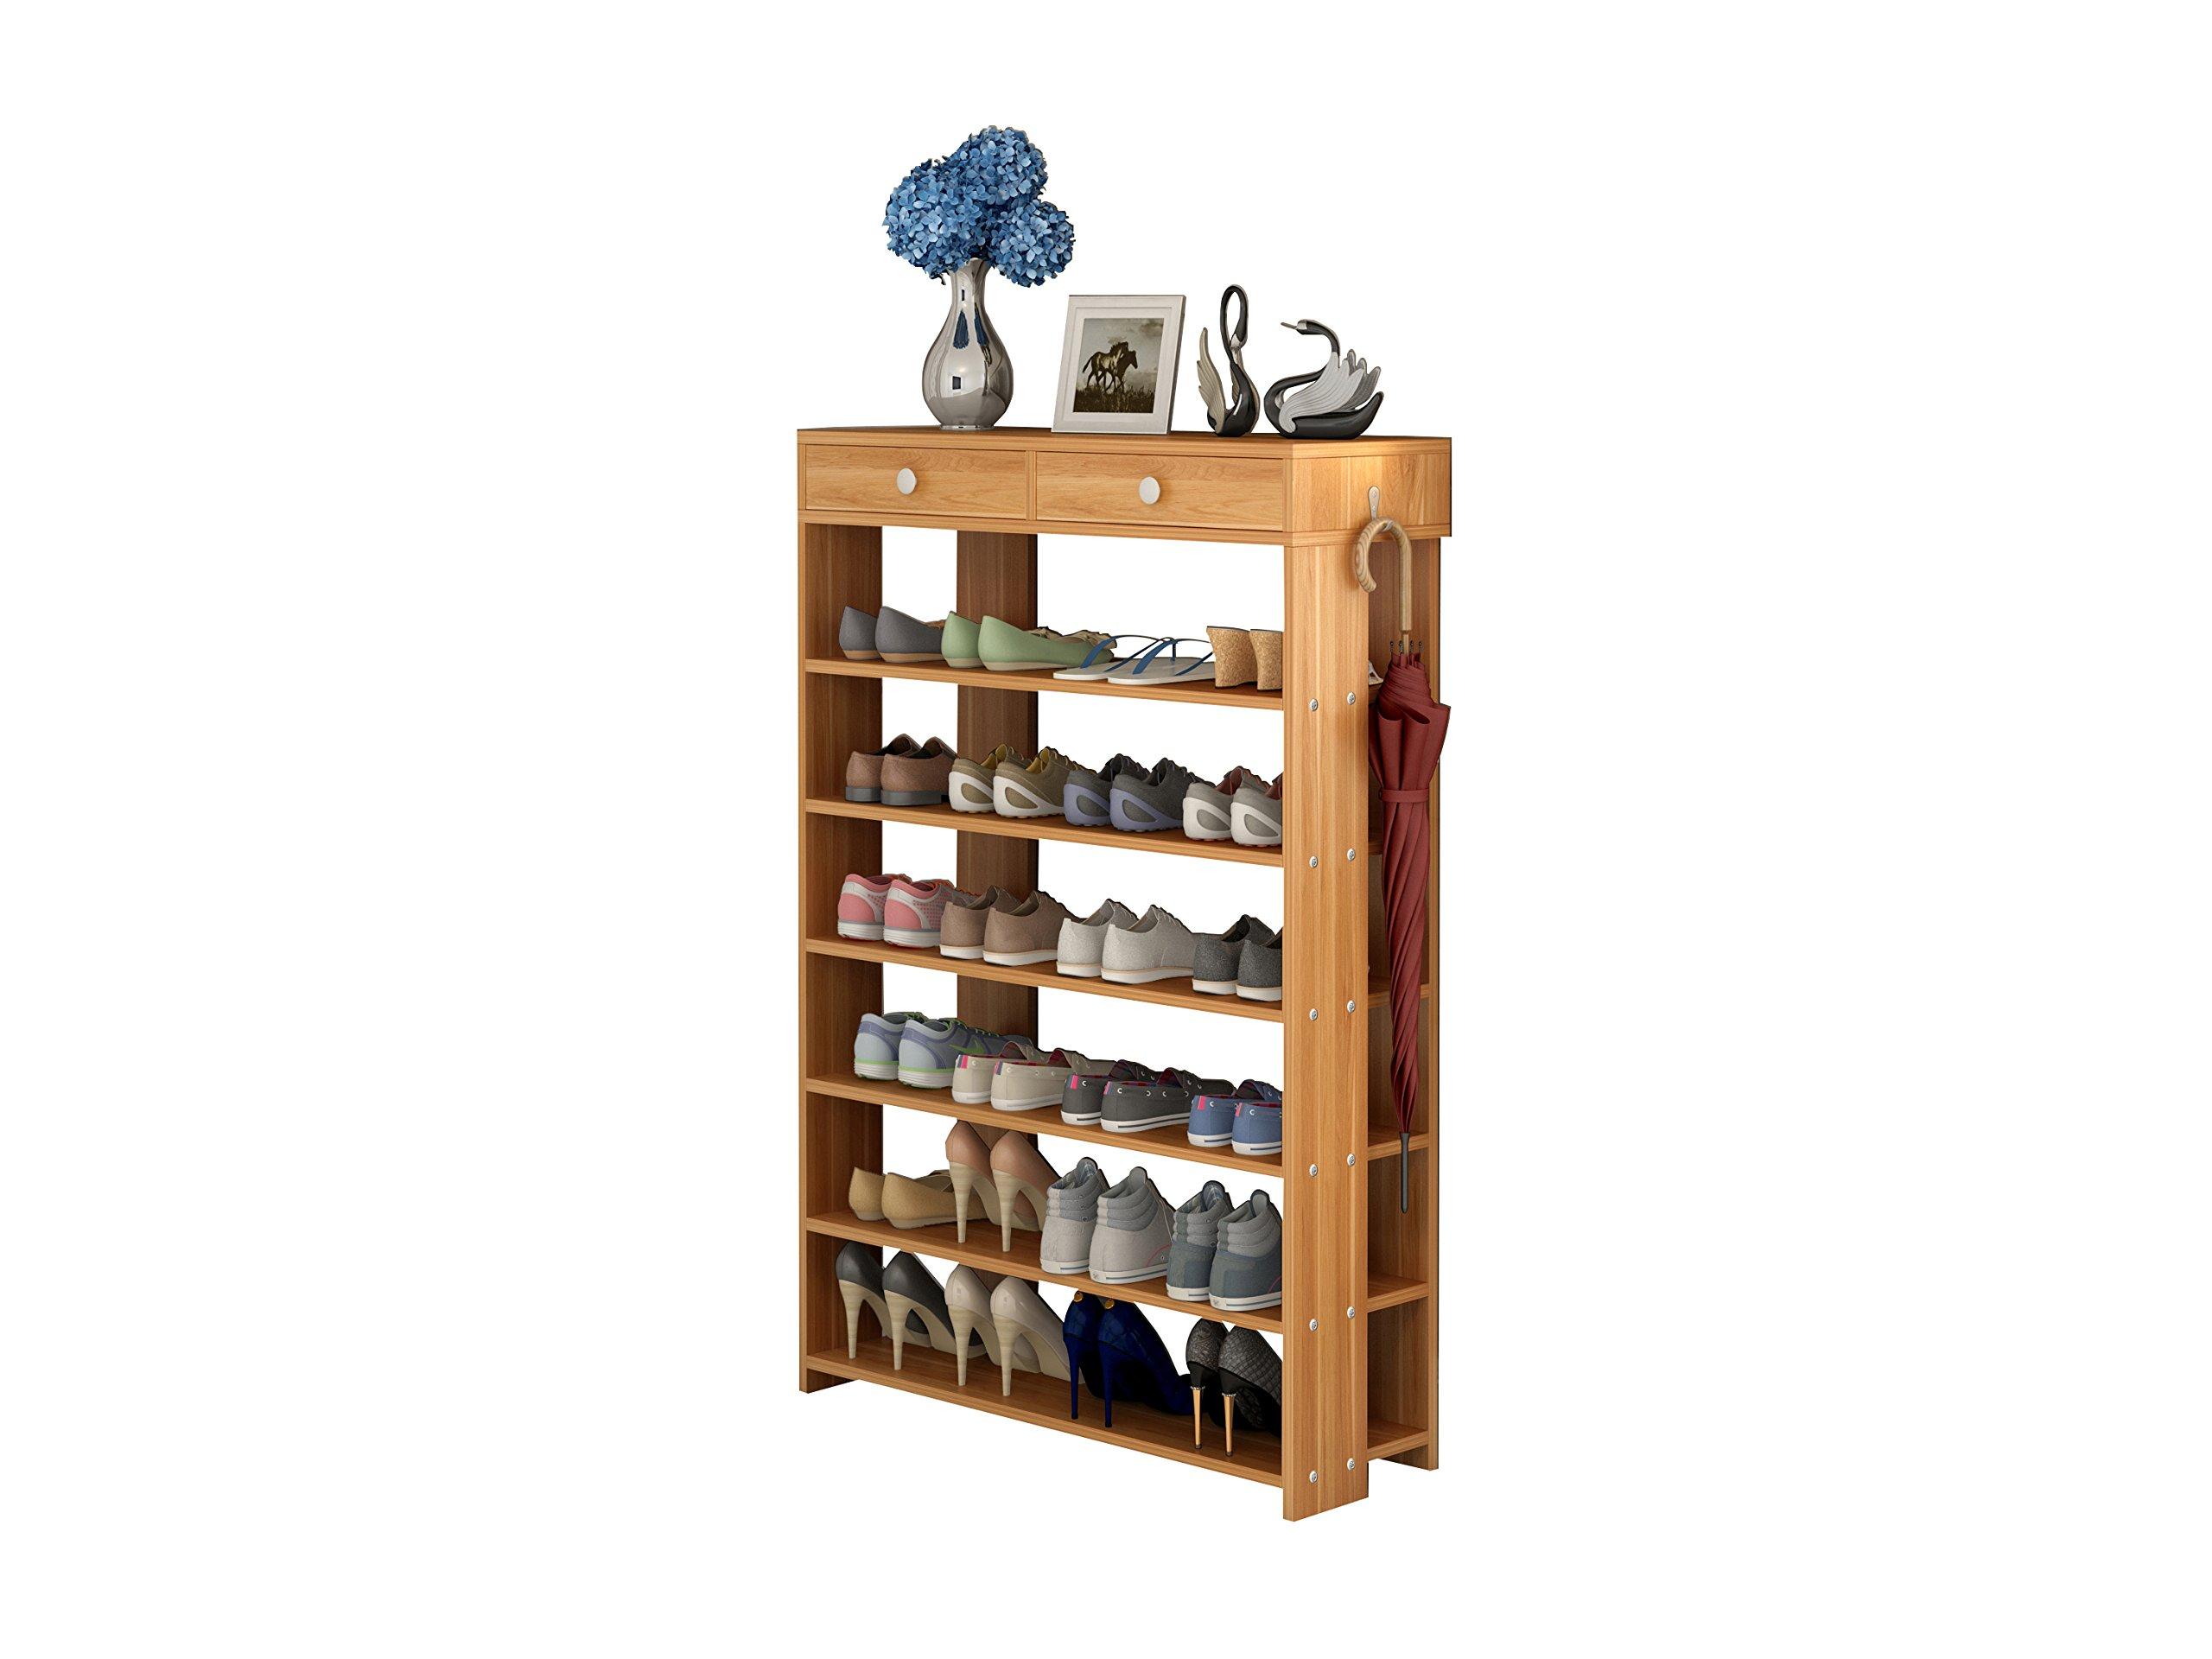 Polar Aurora Shoe Racks 7 Tiers Multi-function Economy Storage Rack Standing Shelf Organizer (Wood) by Polar Aurora (Image #1)